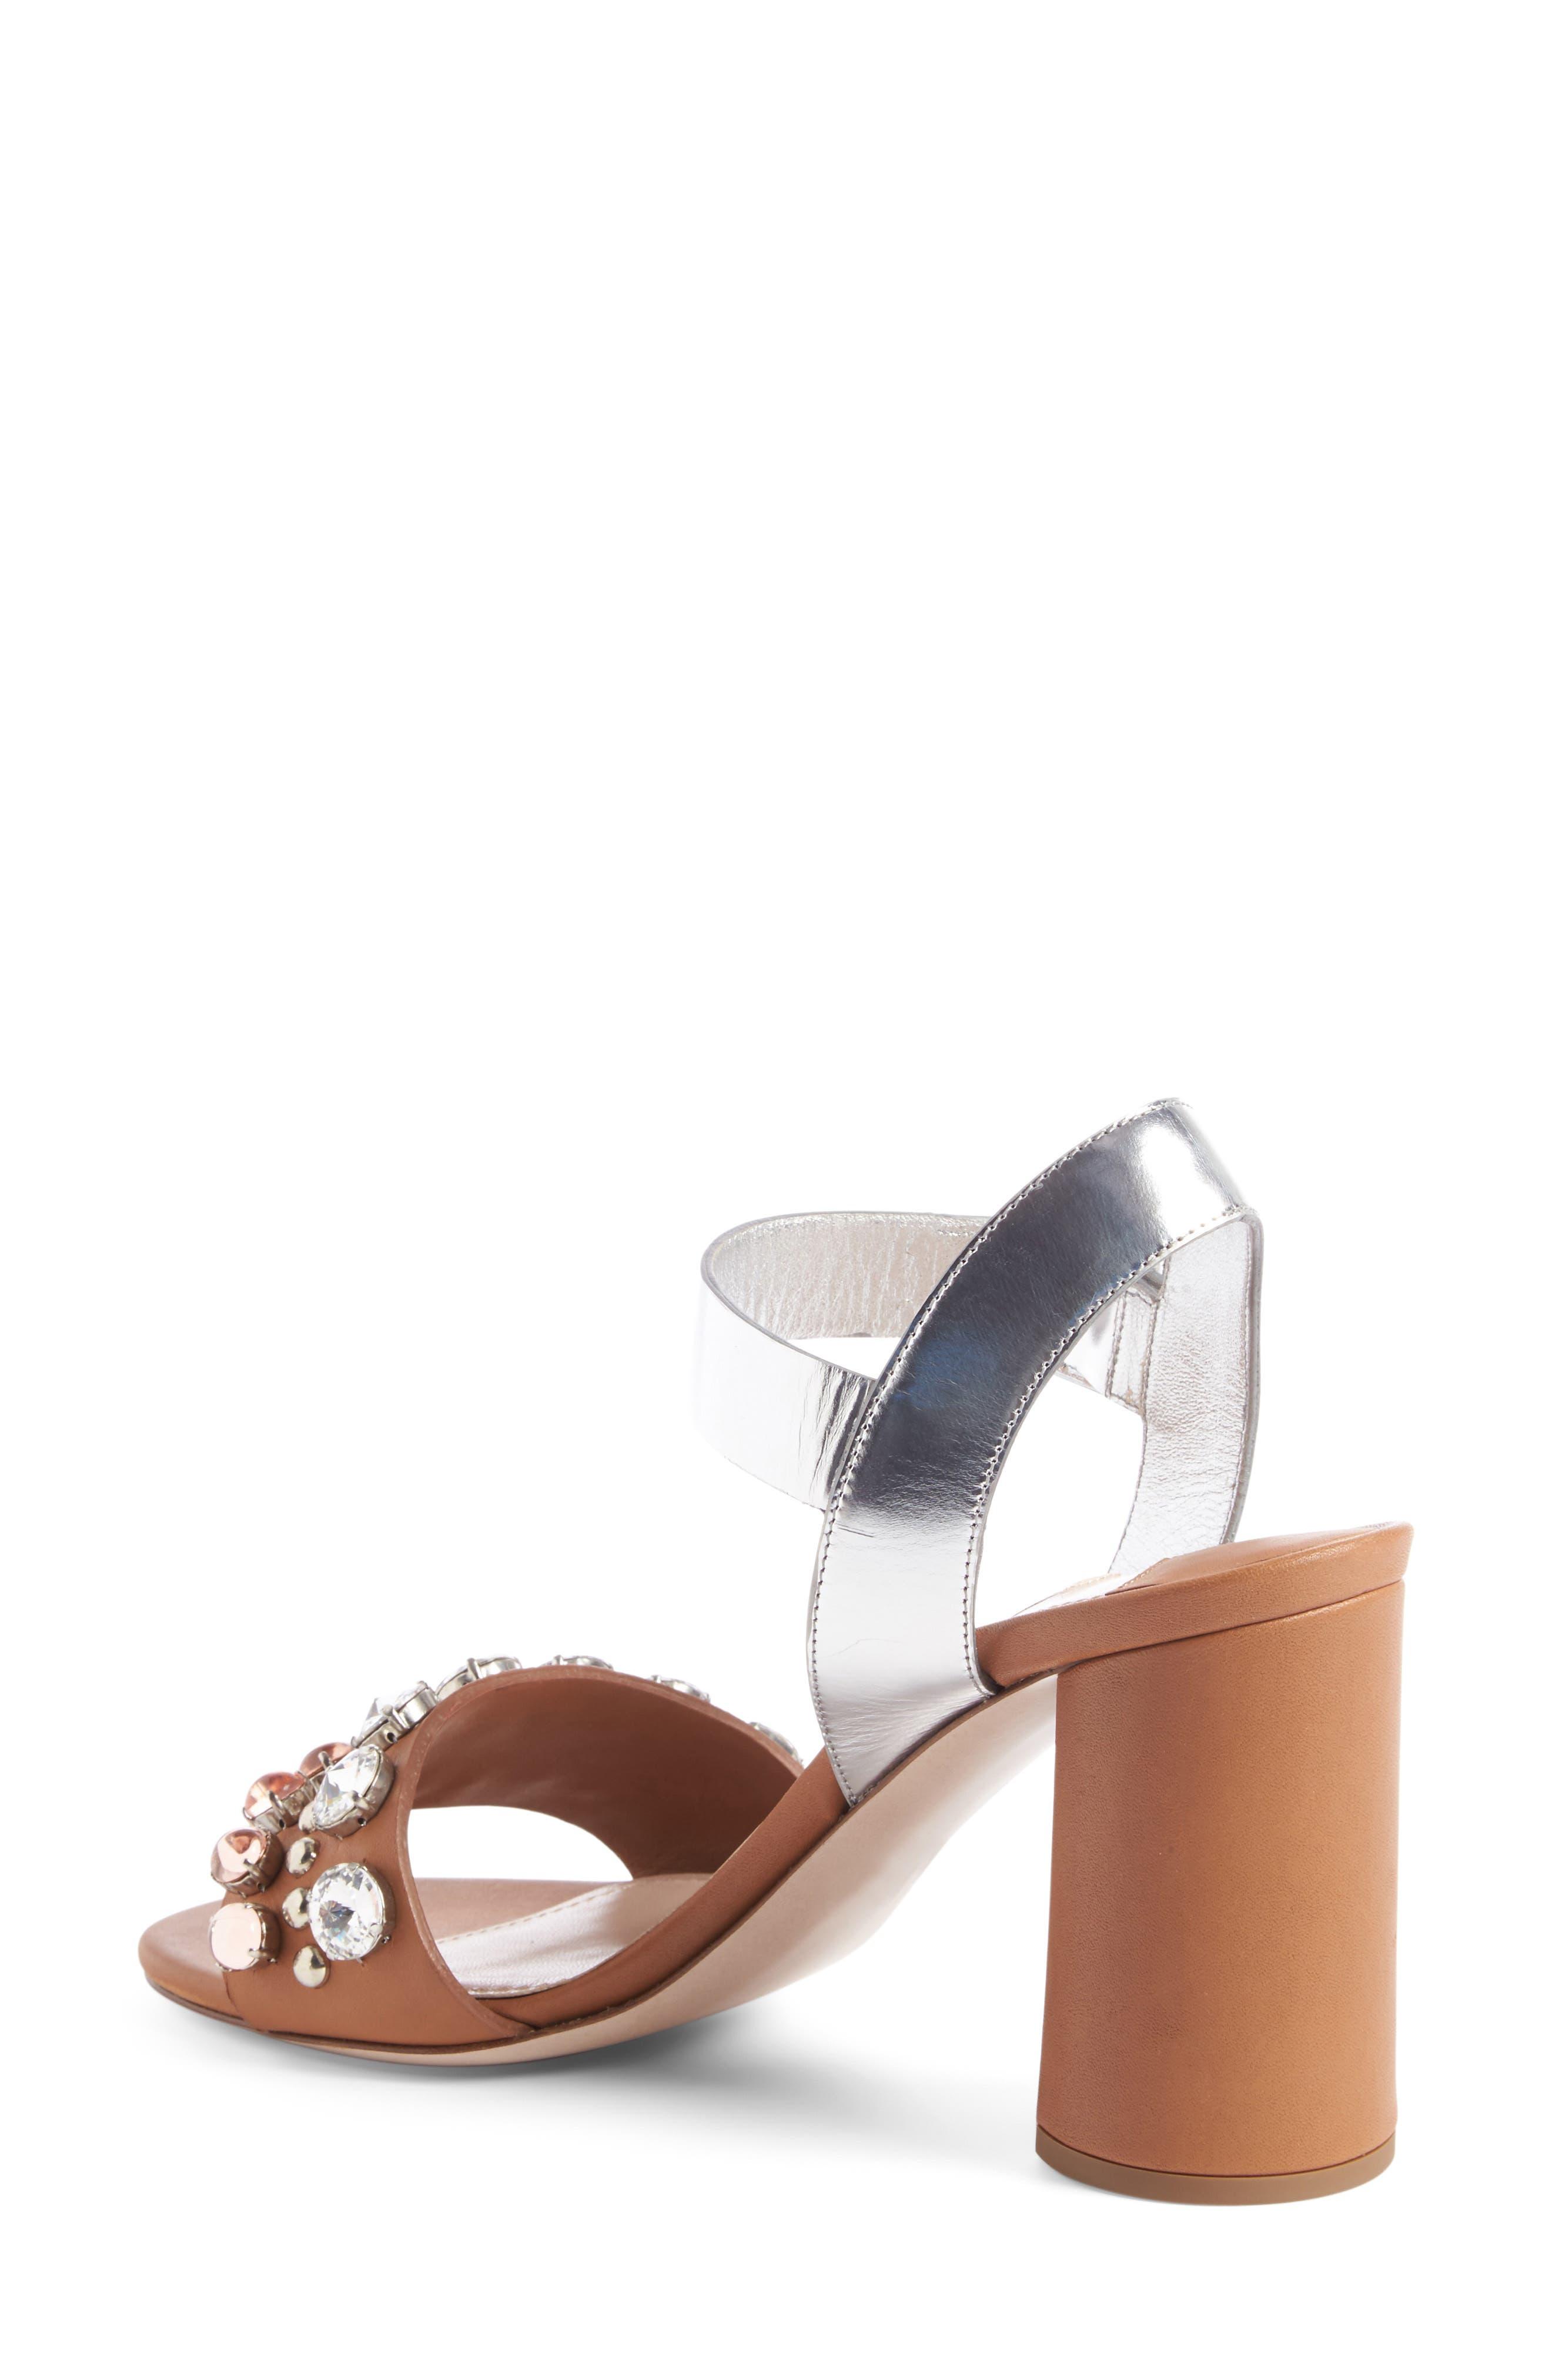 Jewel Sandal,                         Main,                         color, 200